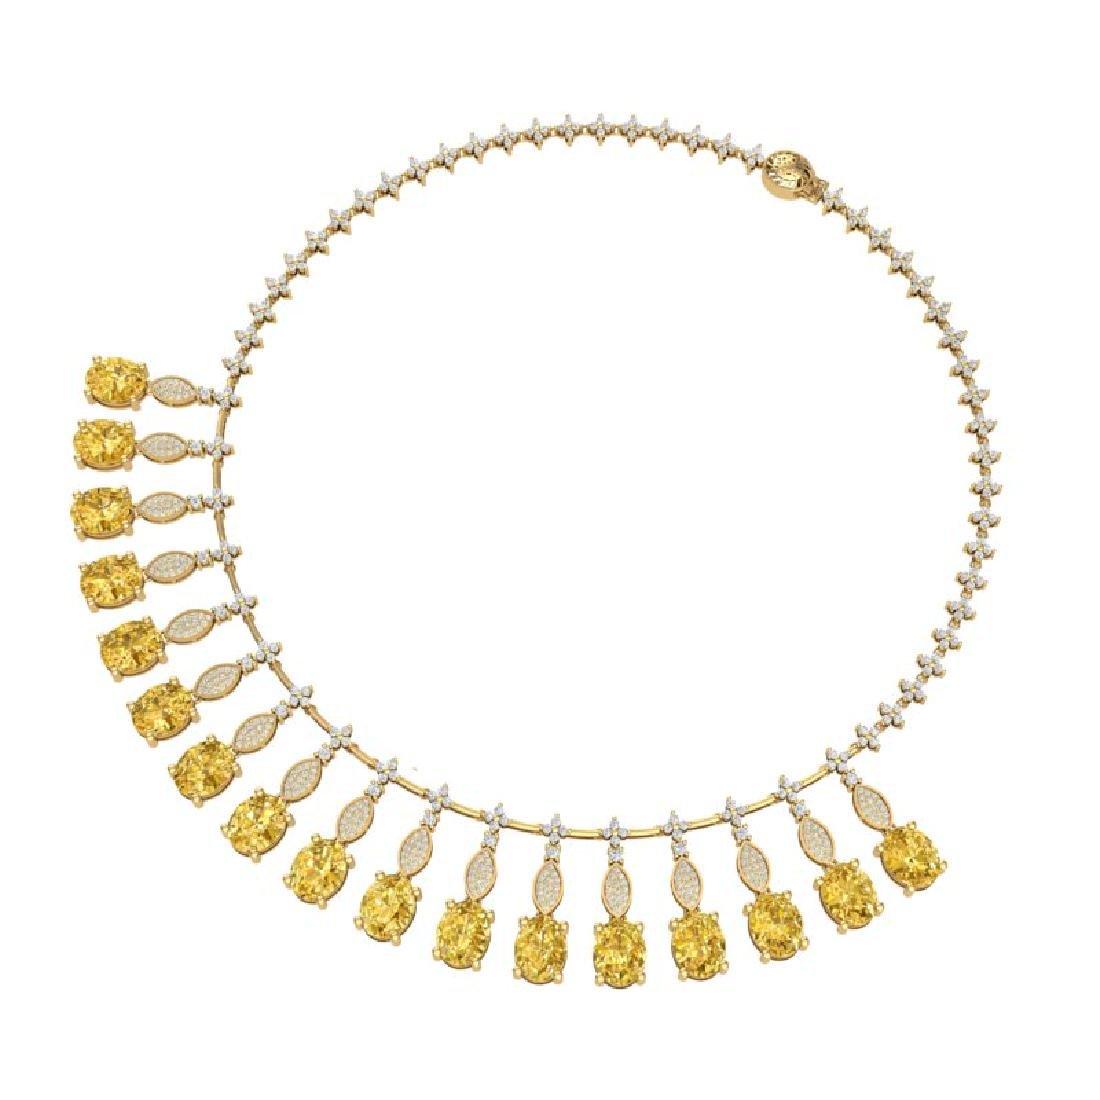 50.16 CTW Royalty Canary Citrine & VS Diamond Necklace - 3